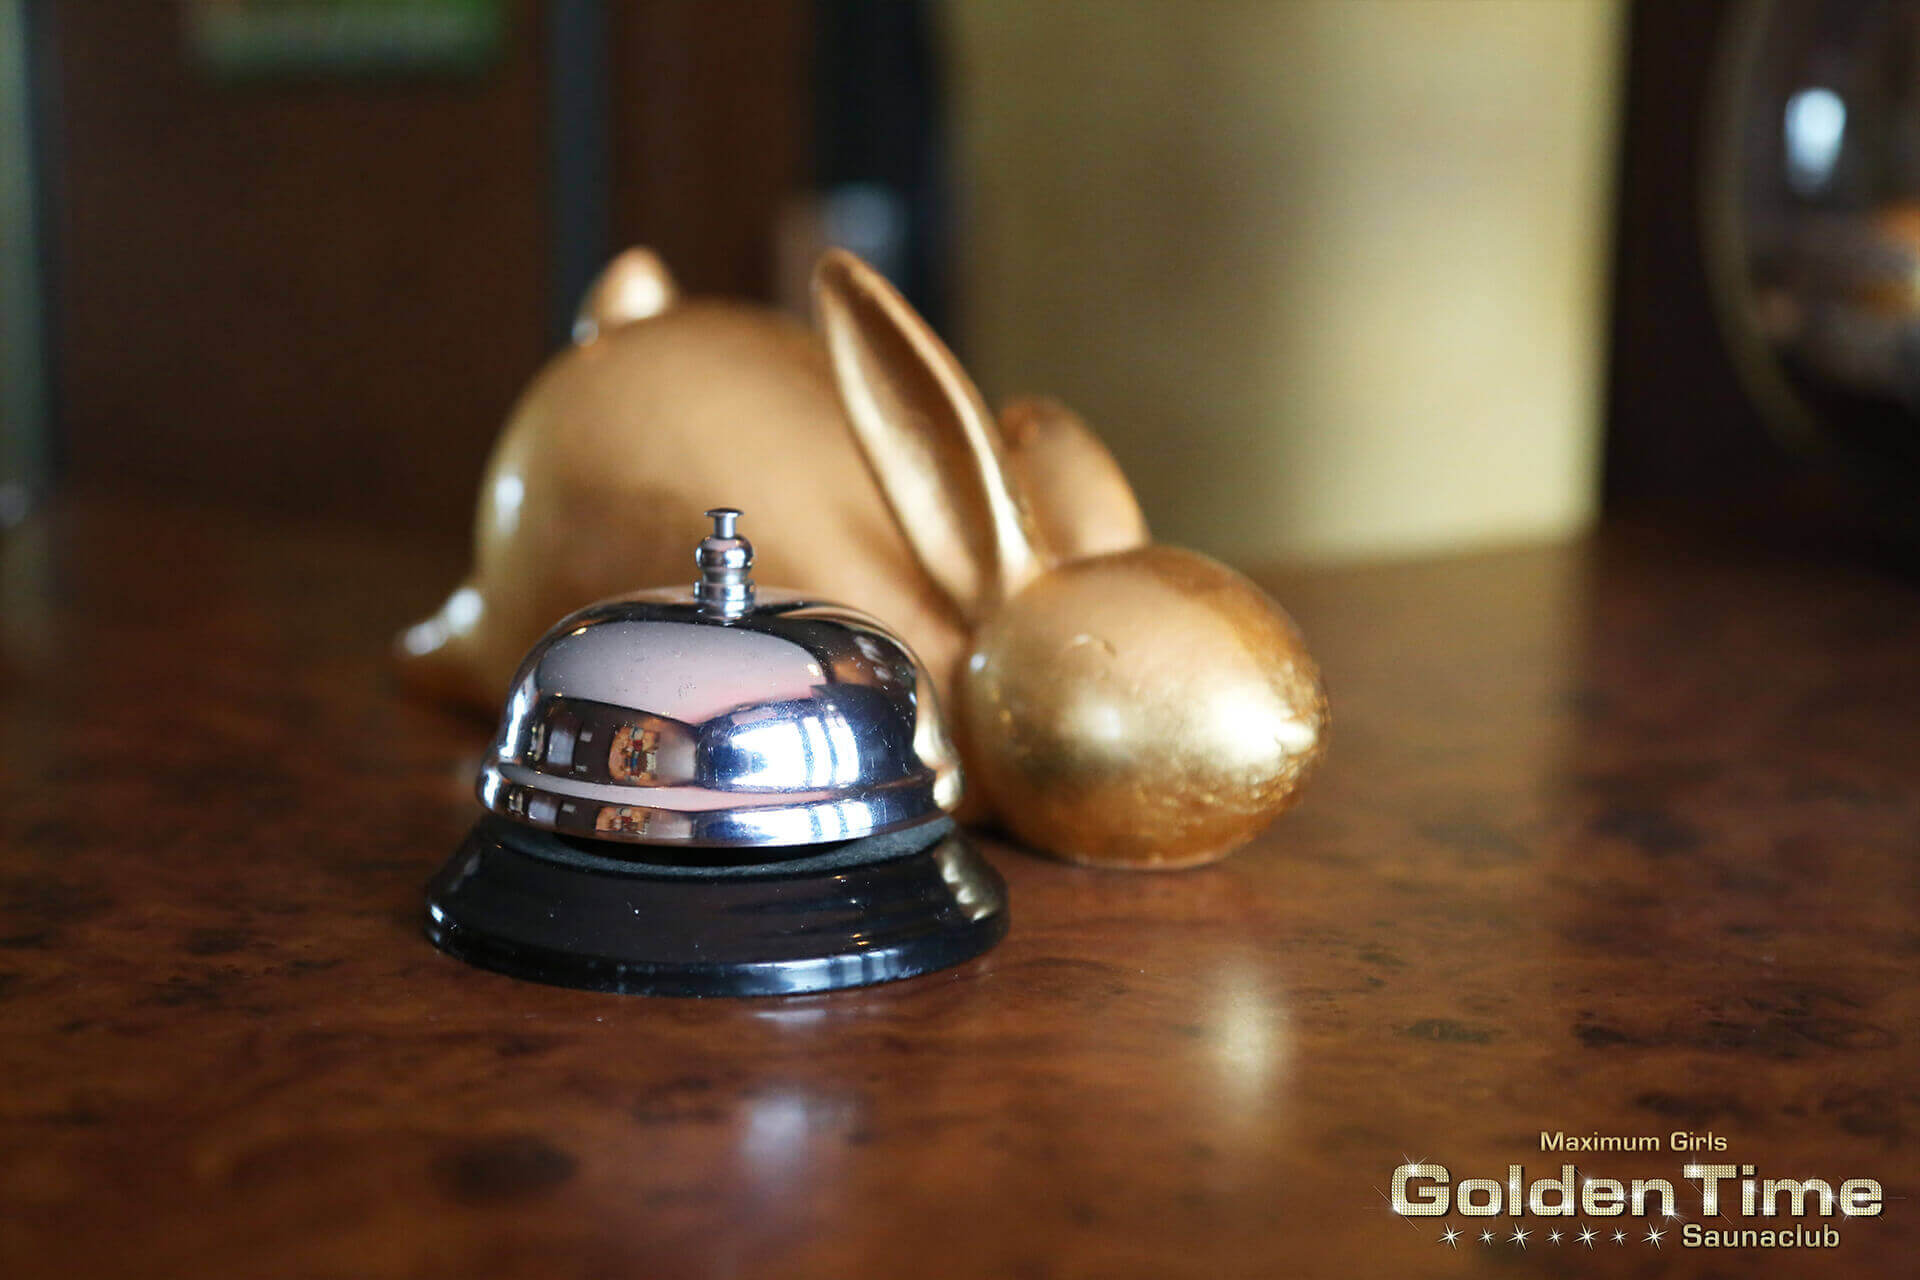 02-ostern-2016-pic-08-goldentime-saunaclub.jpg